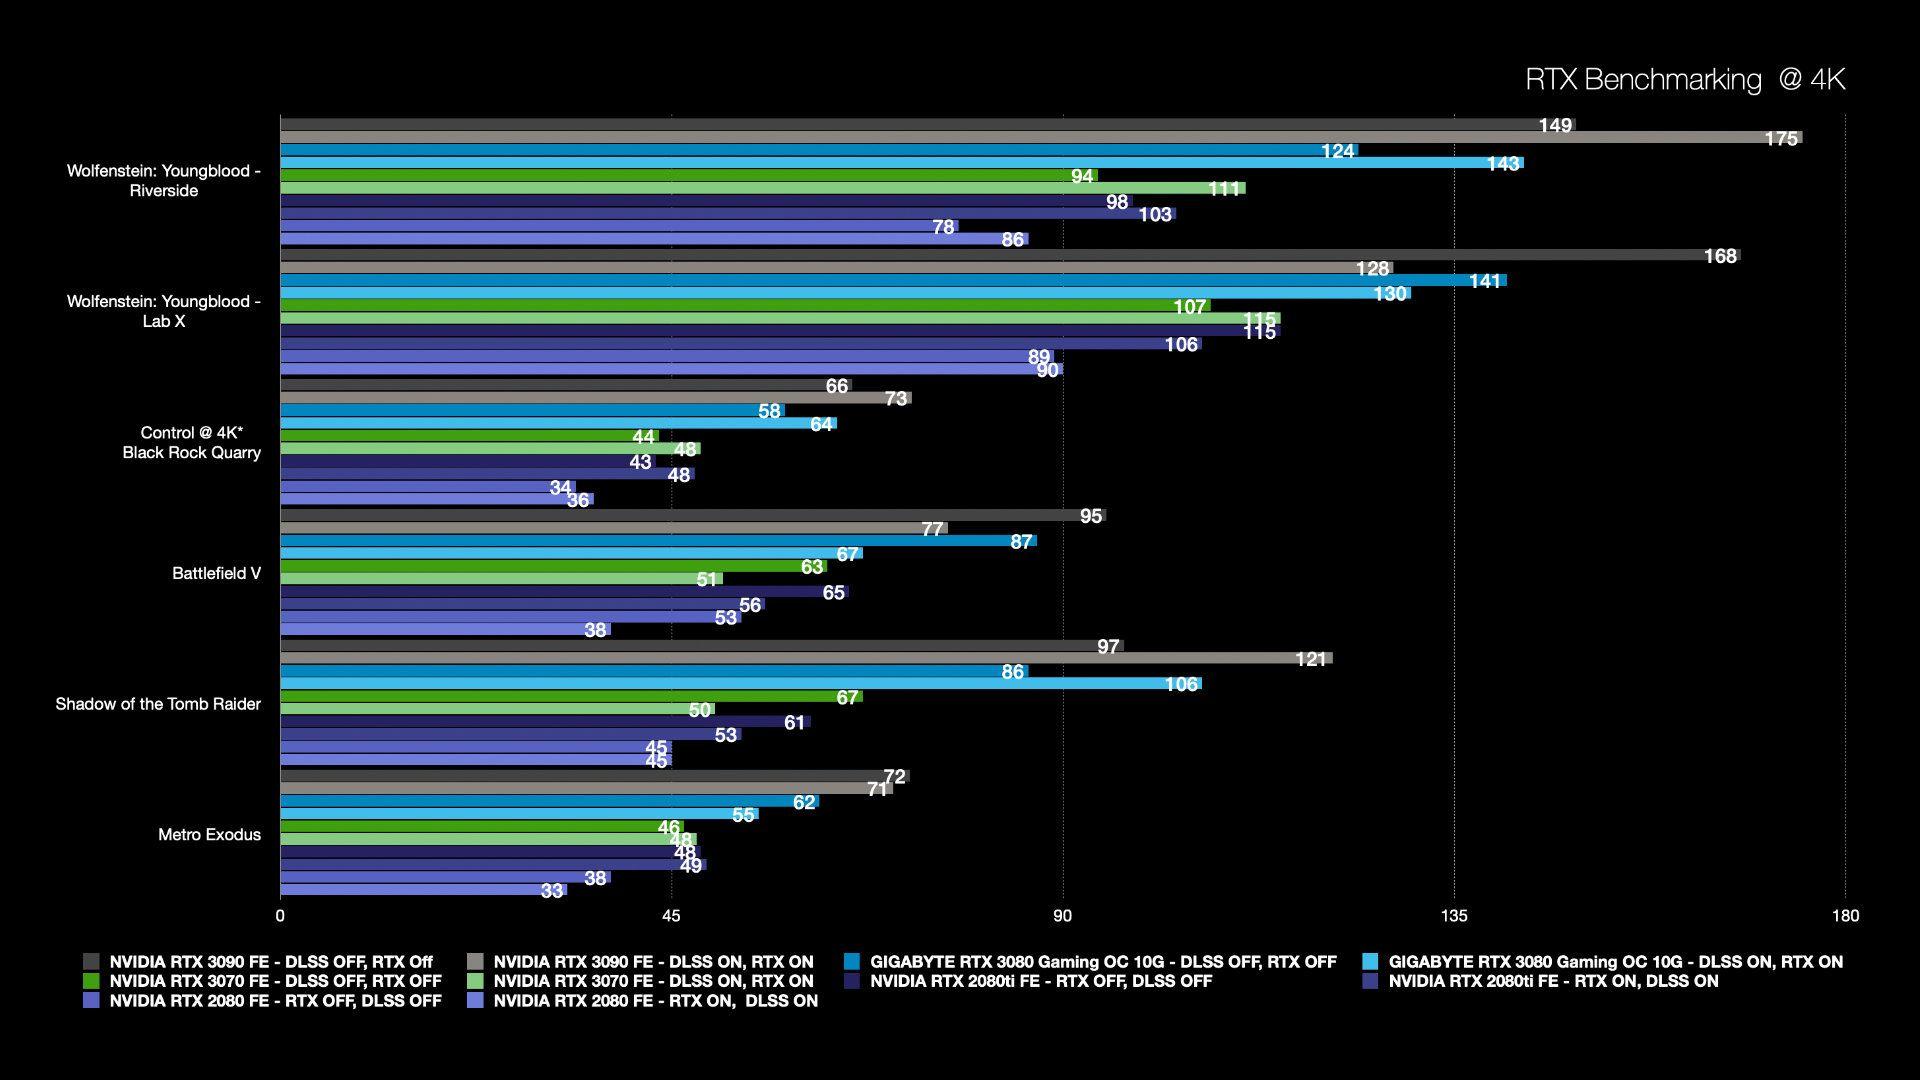 4K RTX Performance